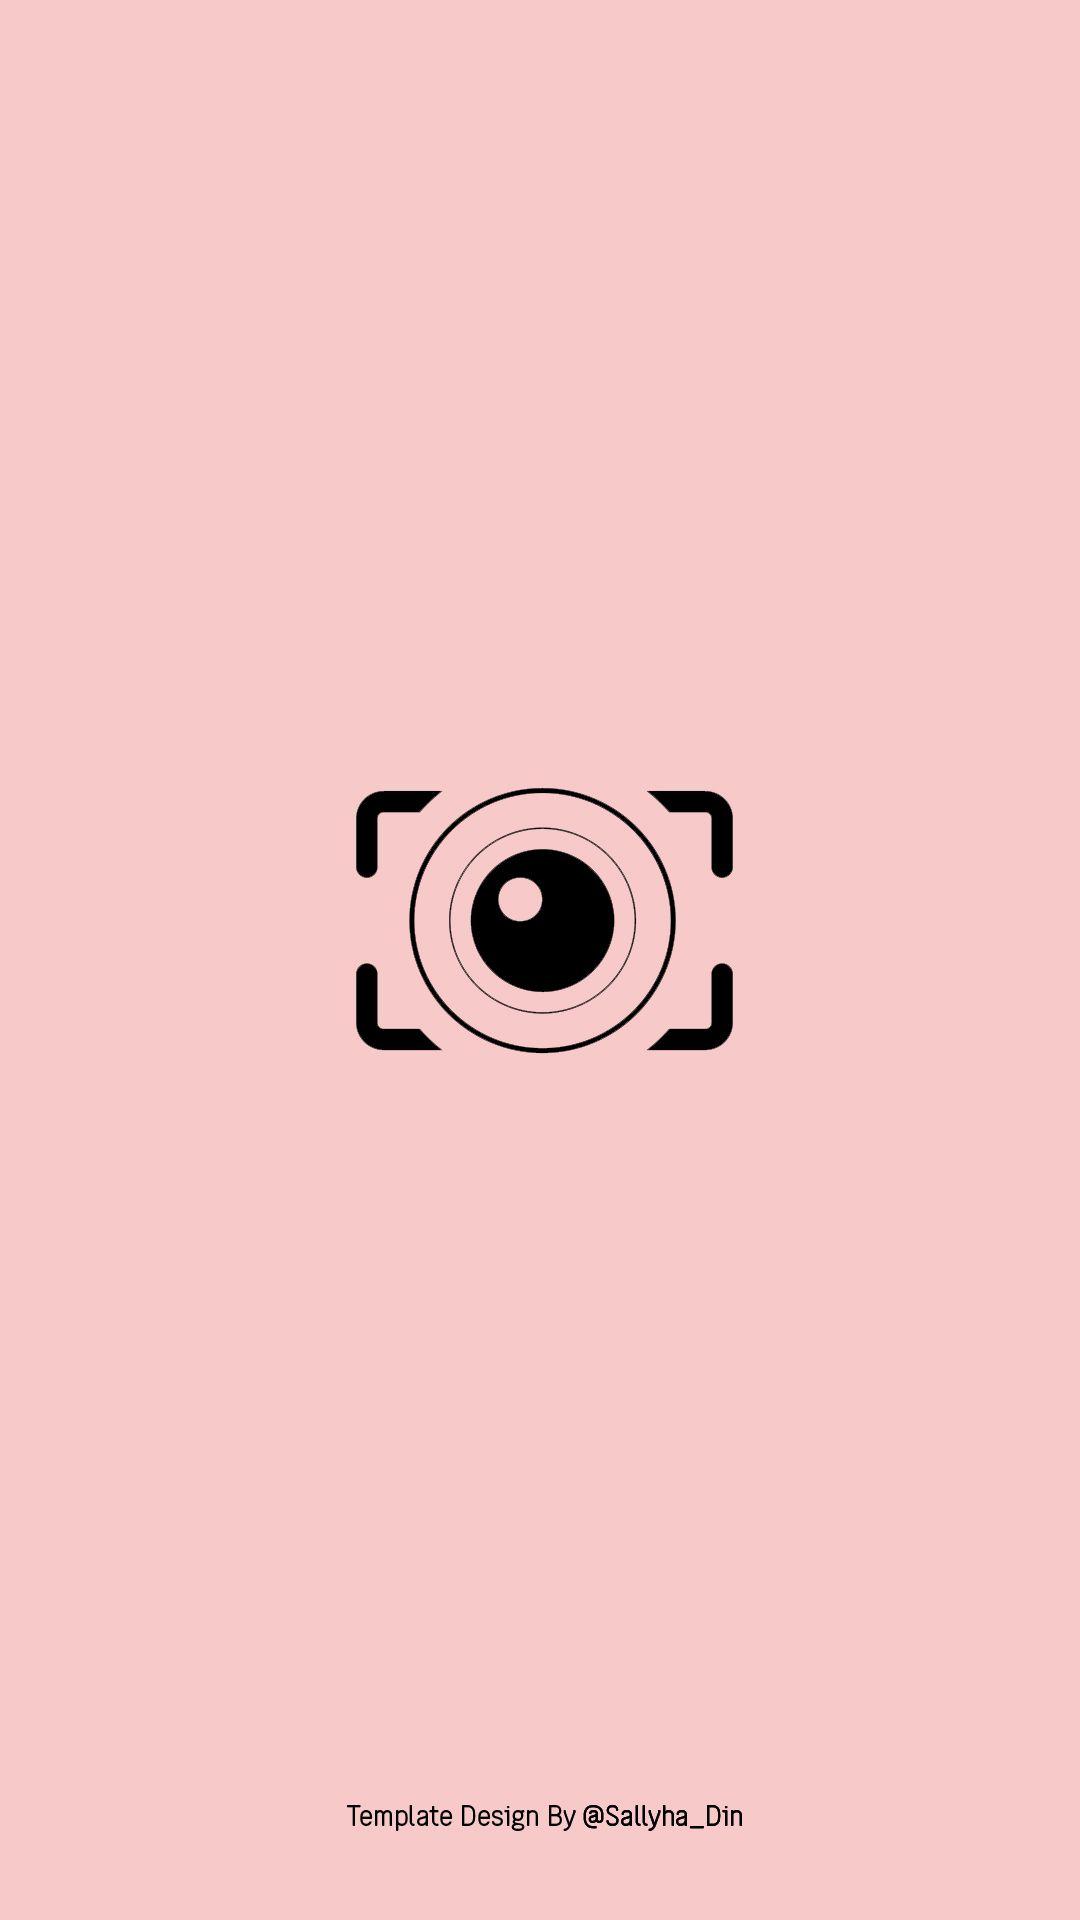 Pink Instagram Logo : instagram, Instagram, Highlight, Covers, @sallyha_din, Www.instagram.com/sallyha_din, Www.sall…, Instagram,, Icons,